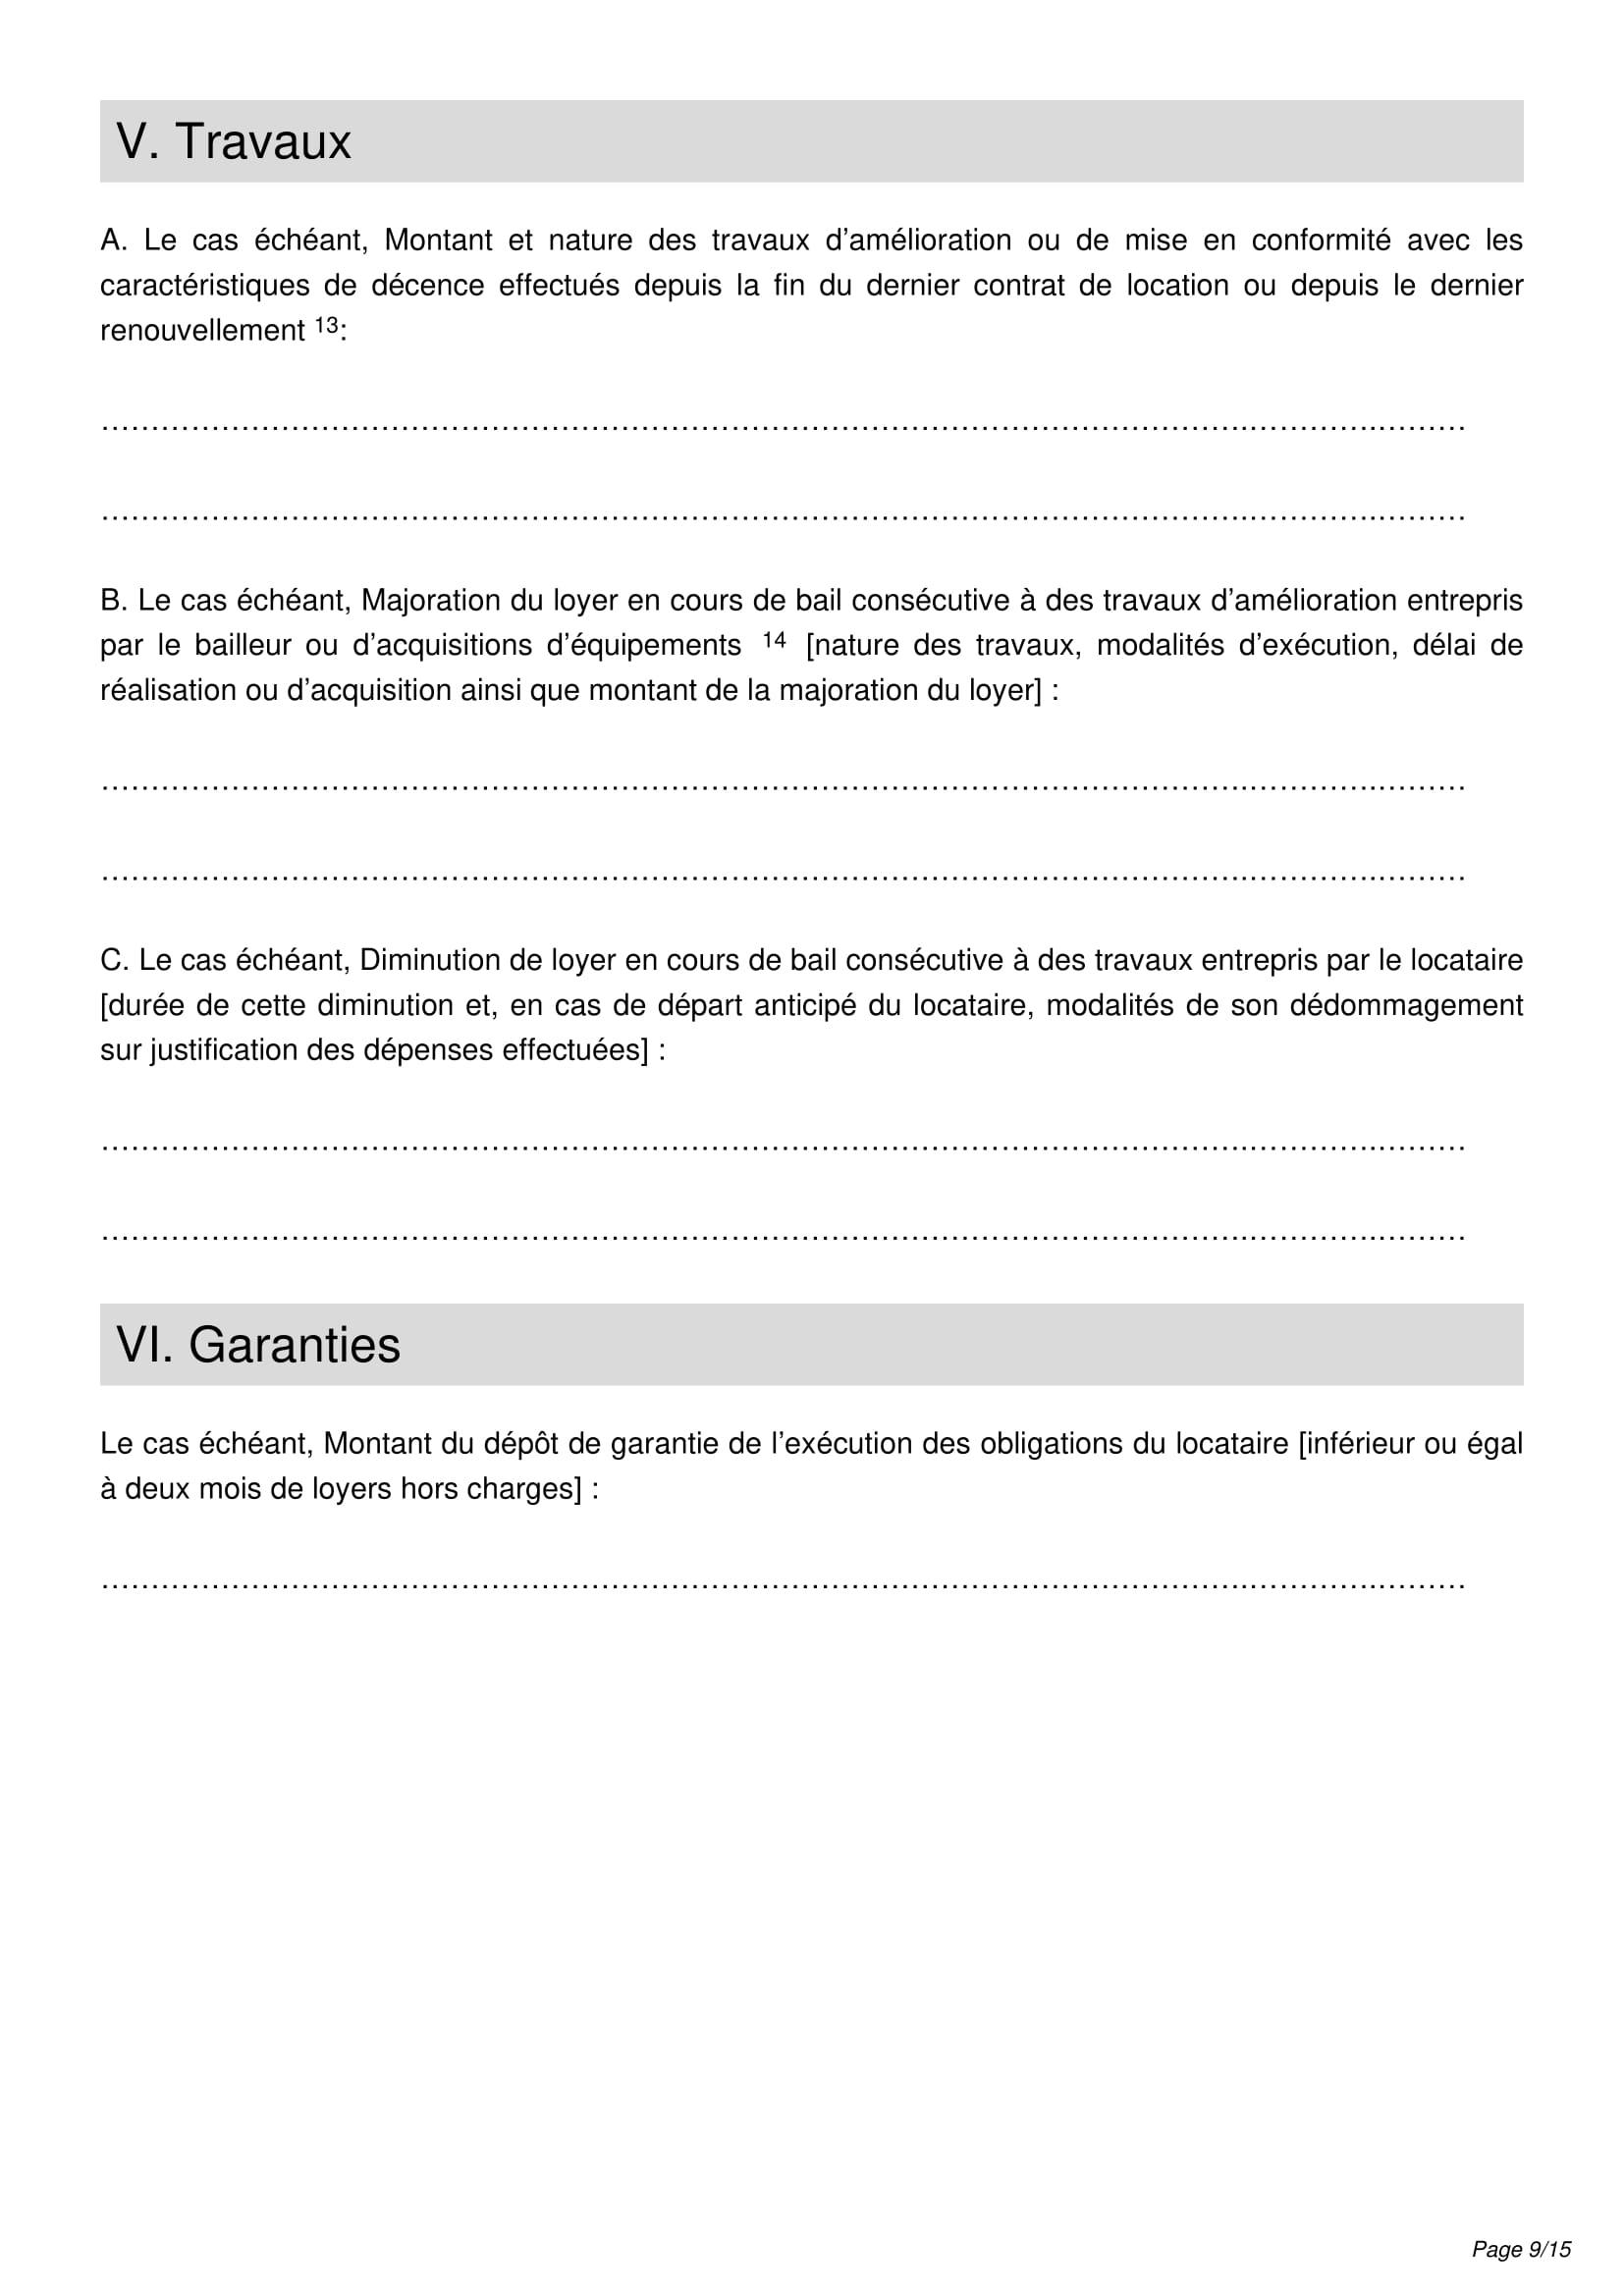 location meuble page 10 contrat de location meuble page 11 contrat de location meuble page 12 contrat de location meuble page 13 contrat de location